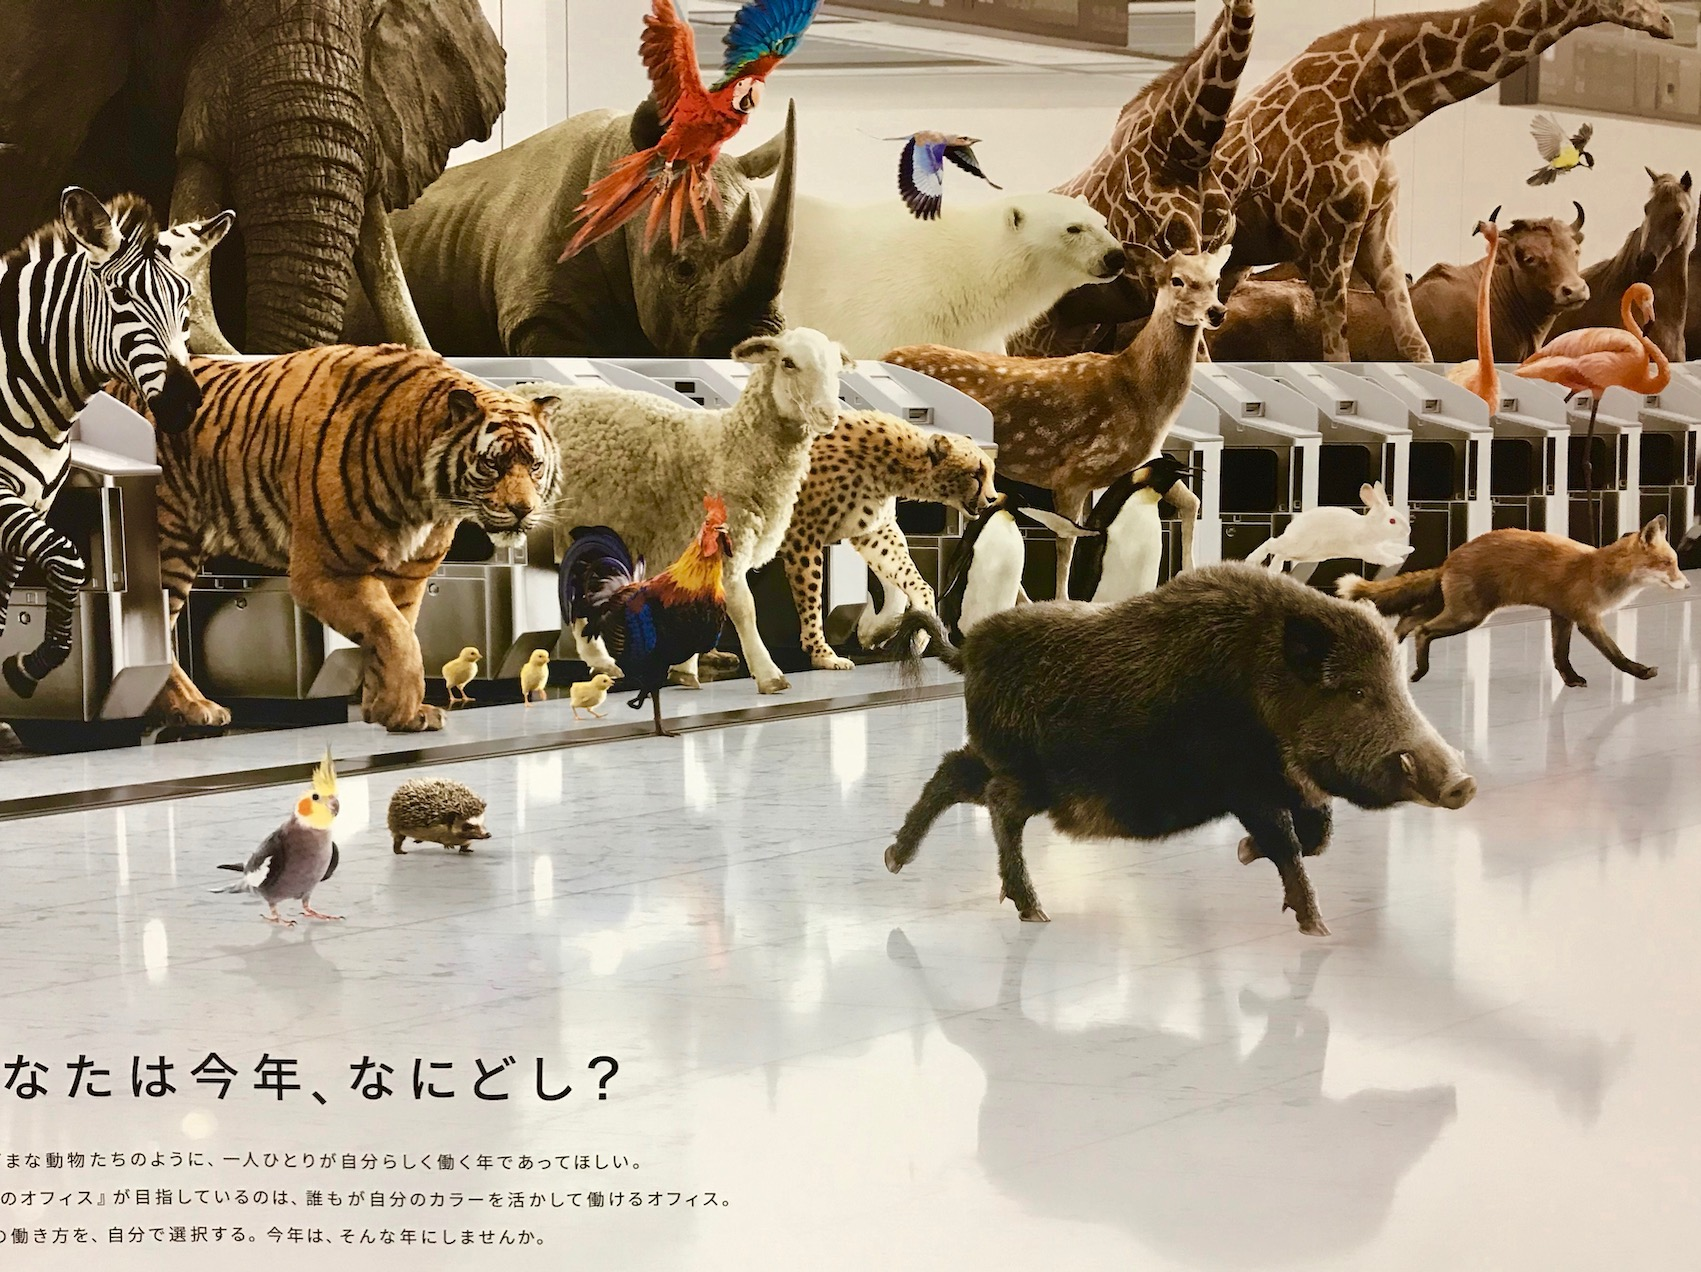 Tokyo Subway Poster Japan.